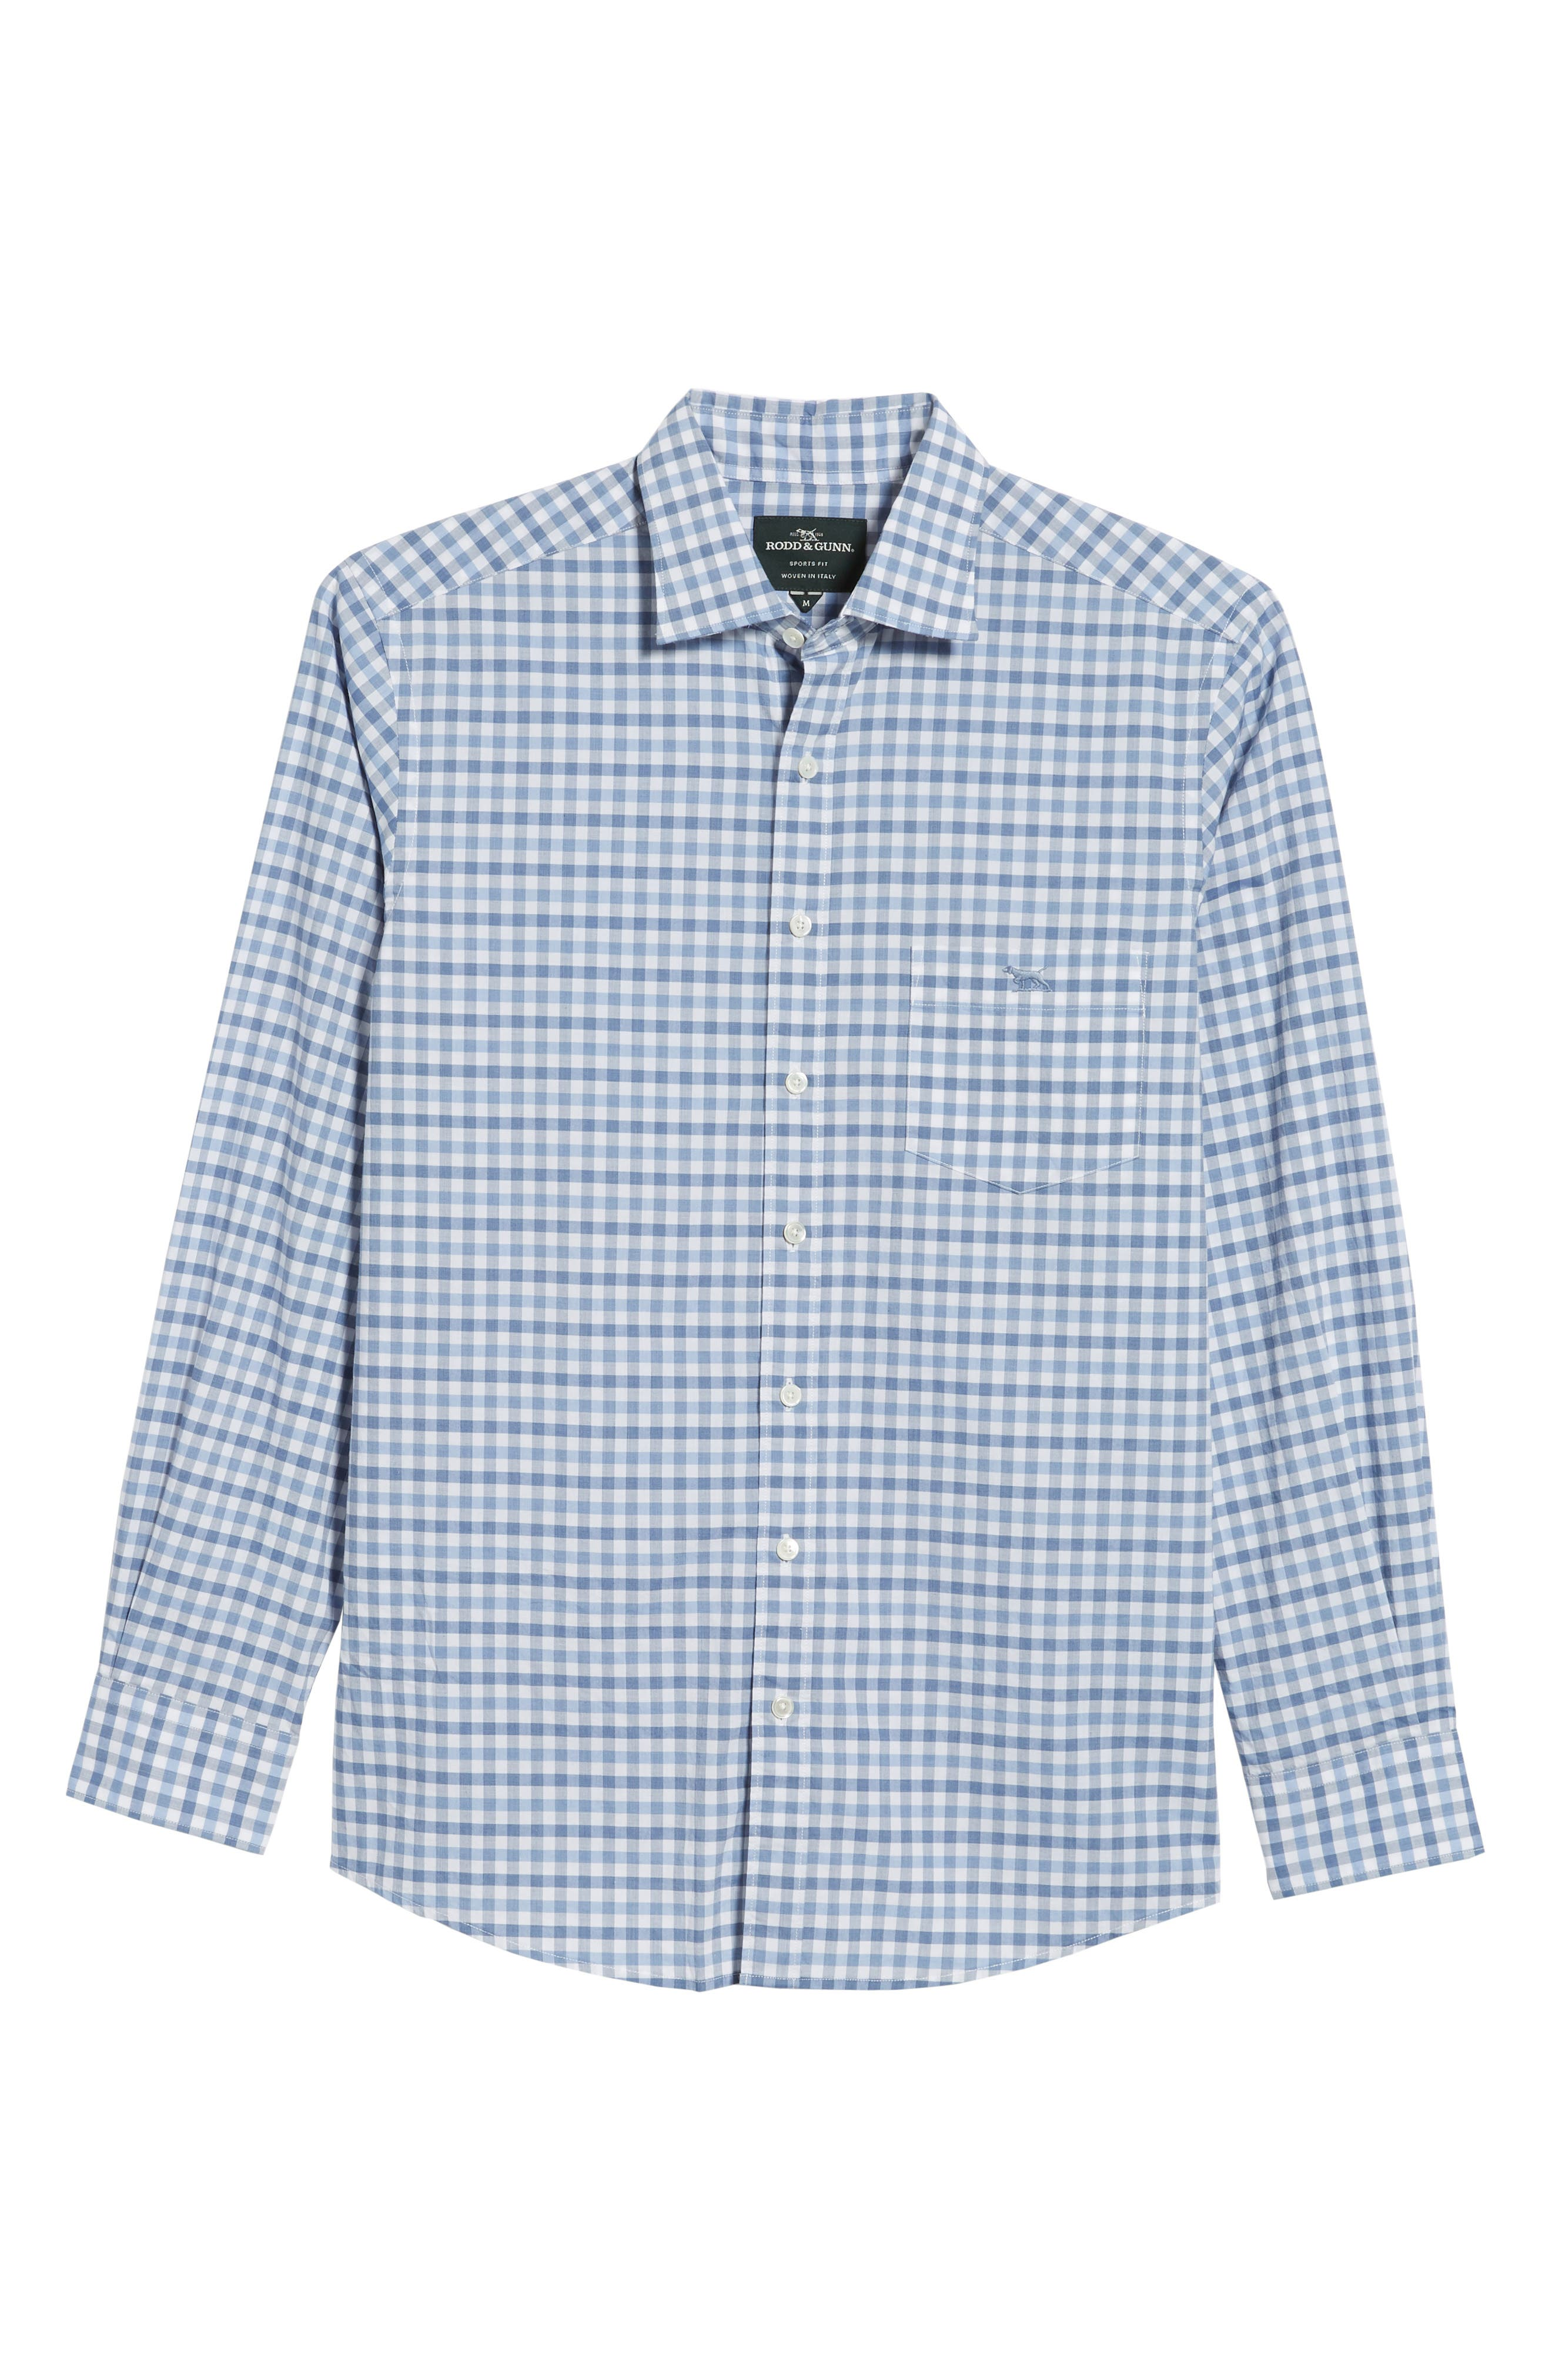 Shorecliffe Regular Fit Gingham Sport Shirt,                             Alternate thumbnail 6, color,                             414